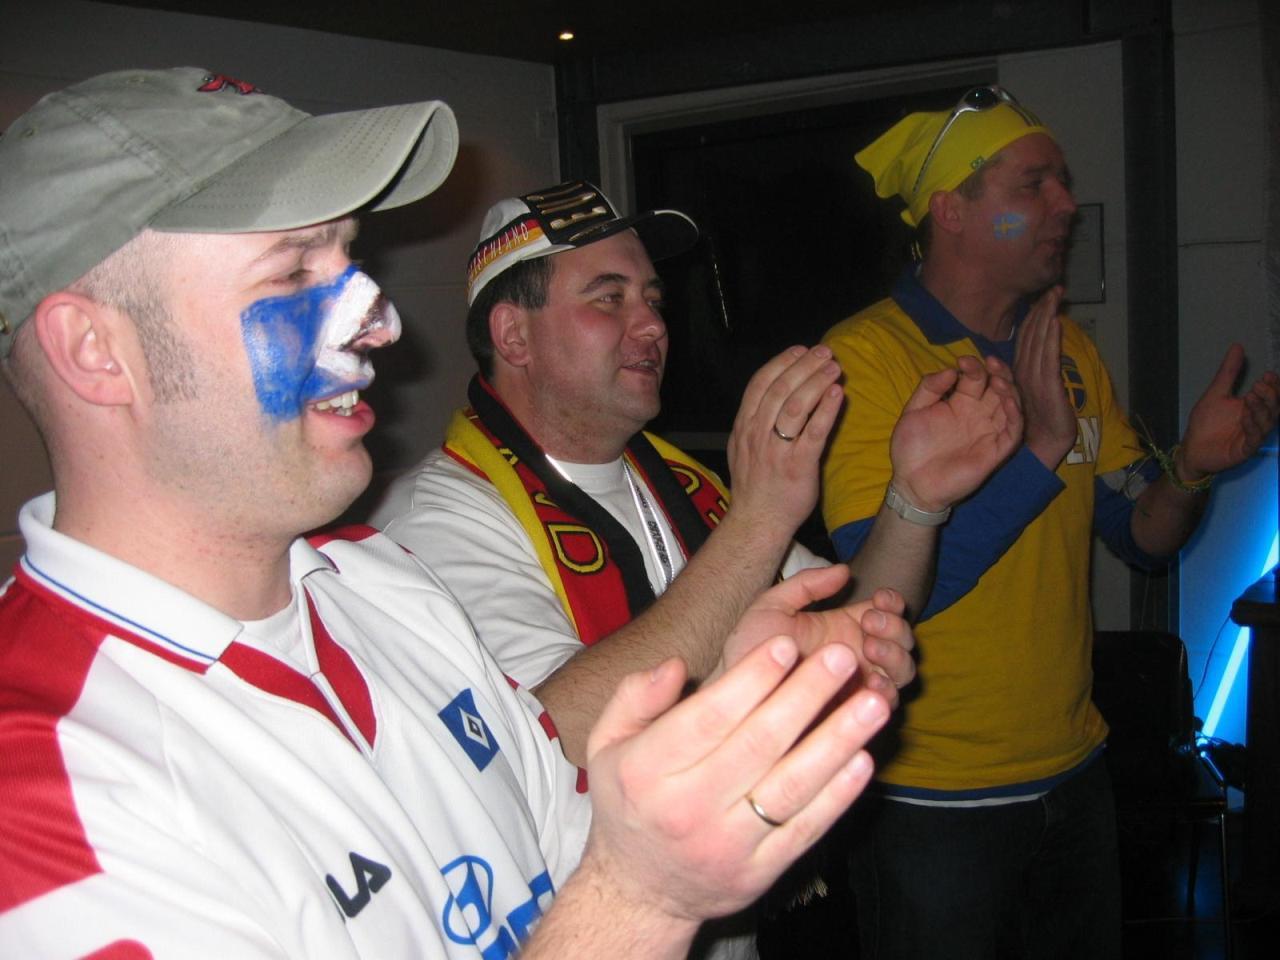 kroenung2006-052